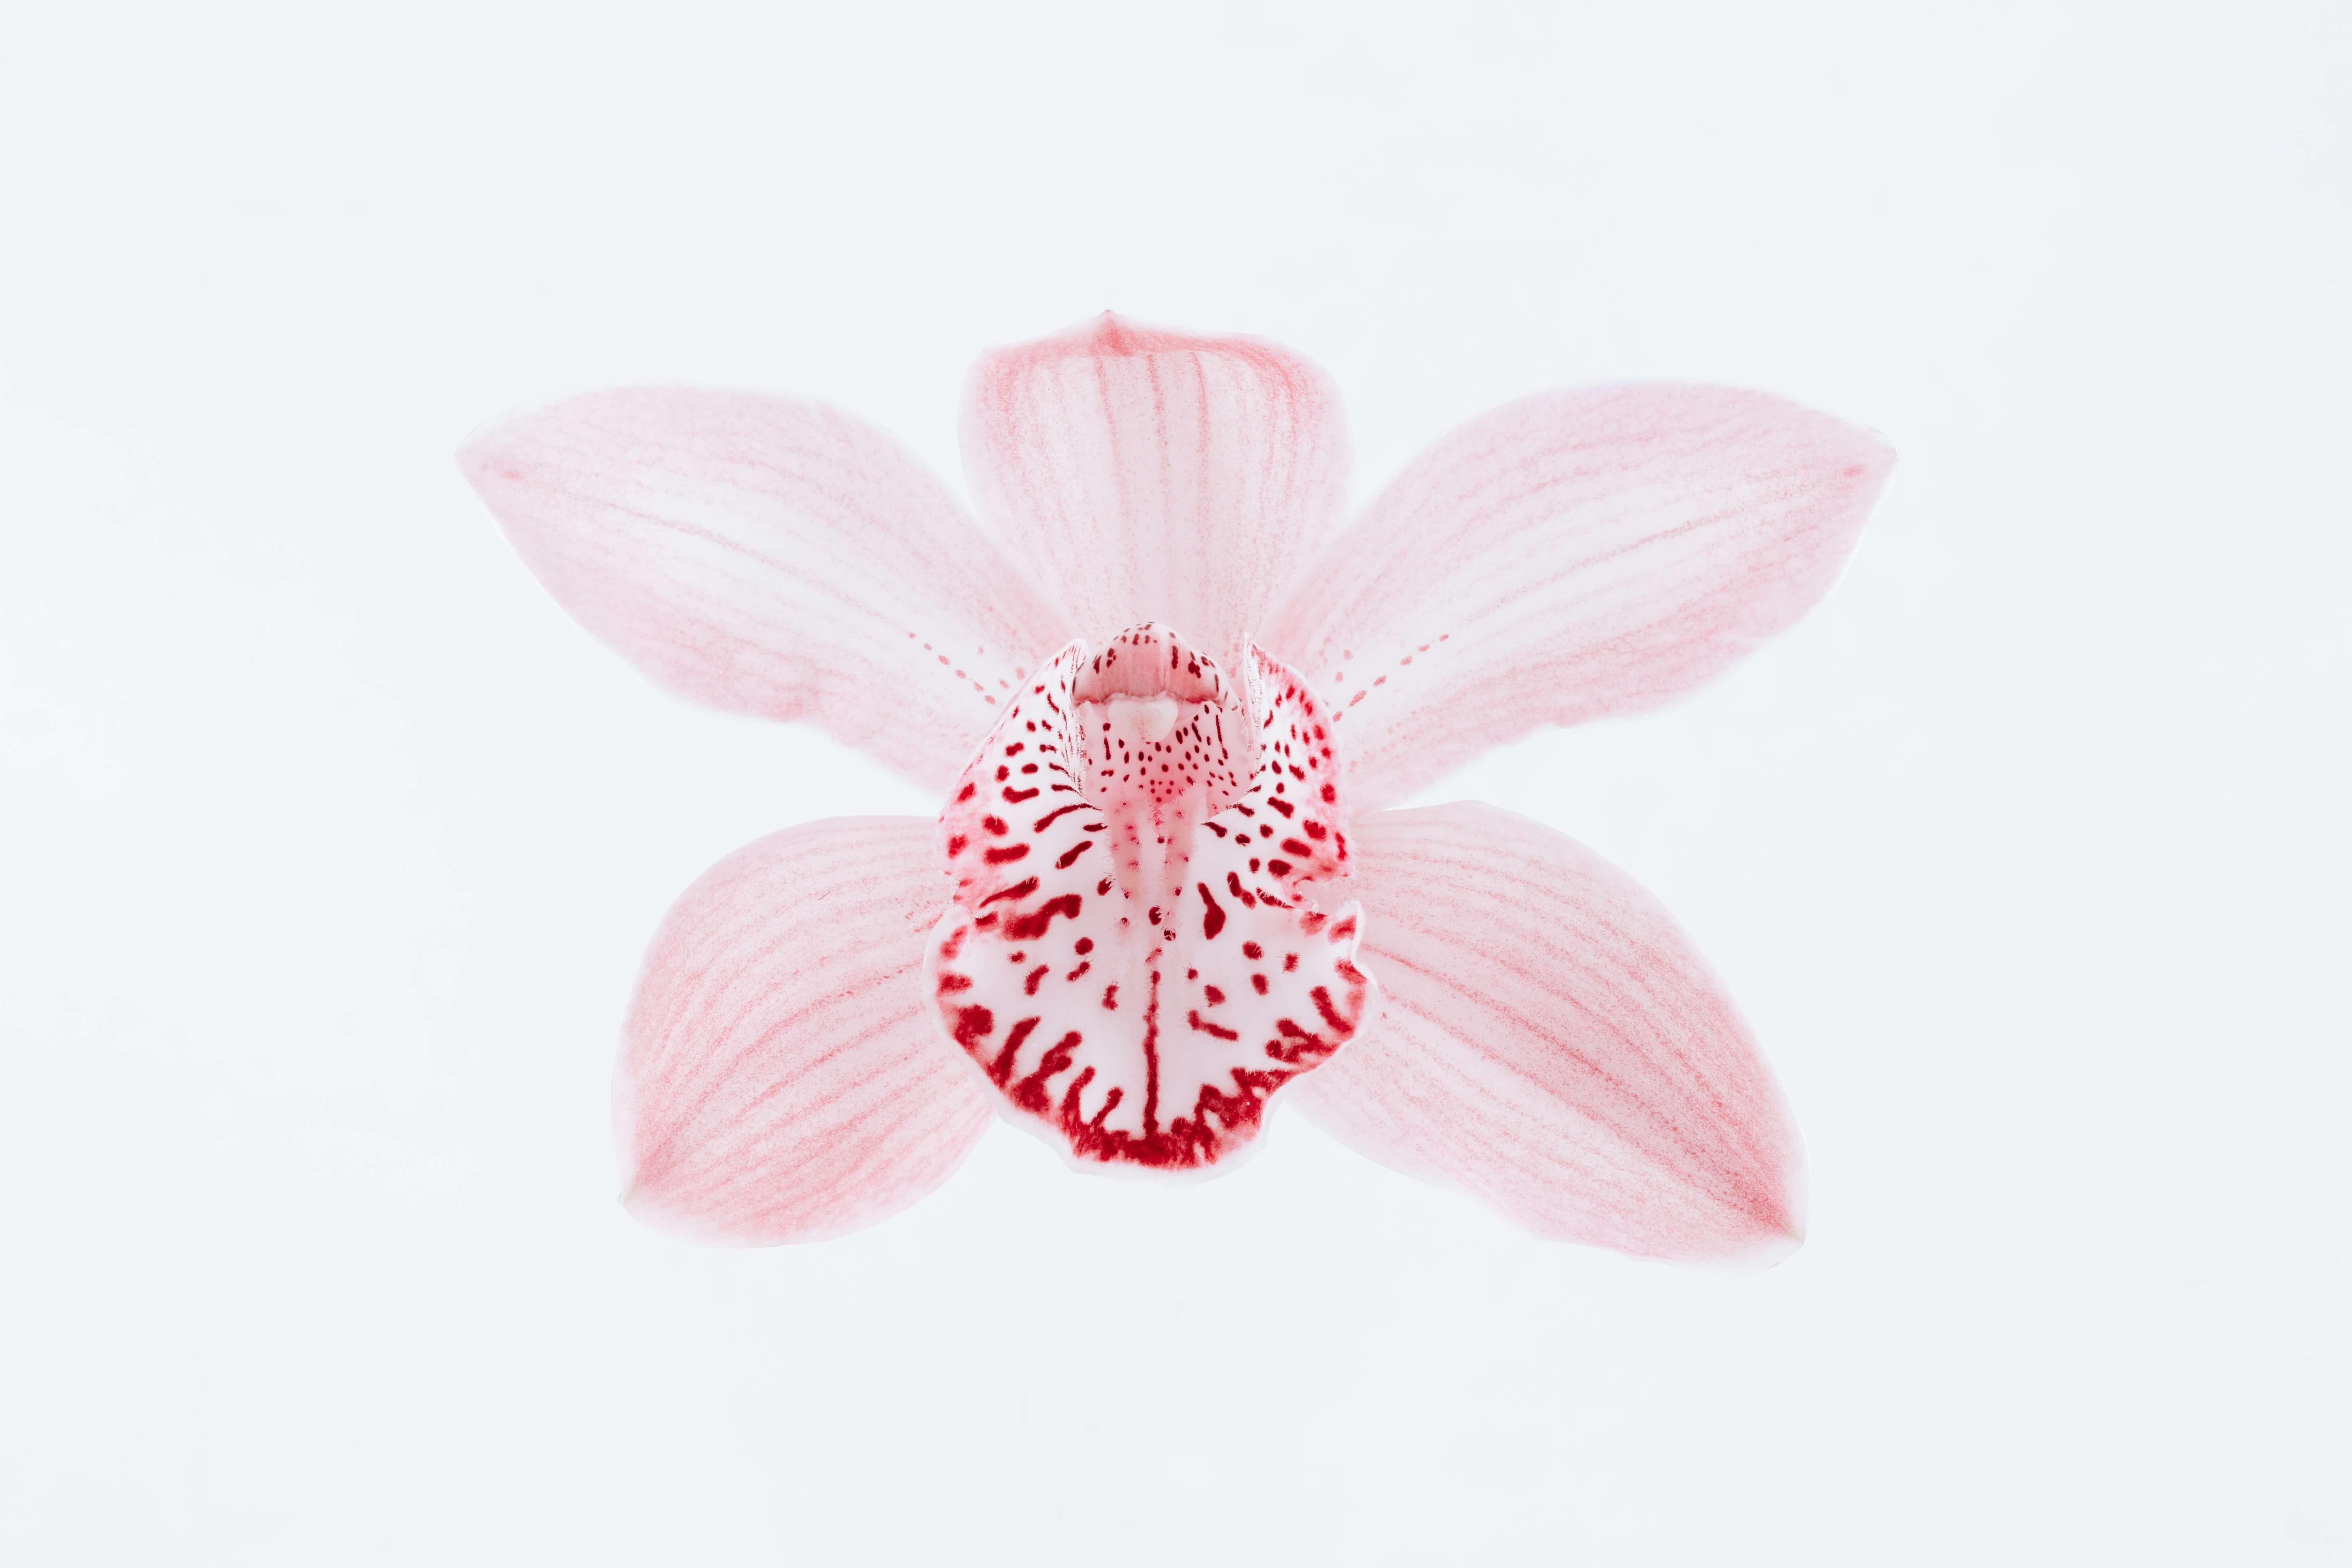 orchidee terrestrial